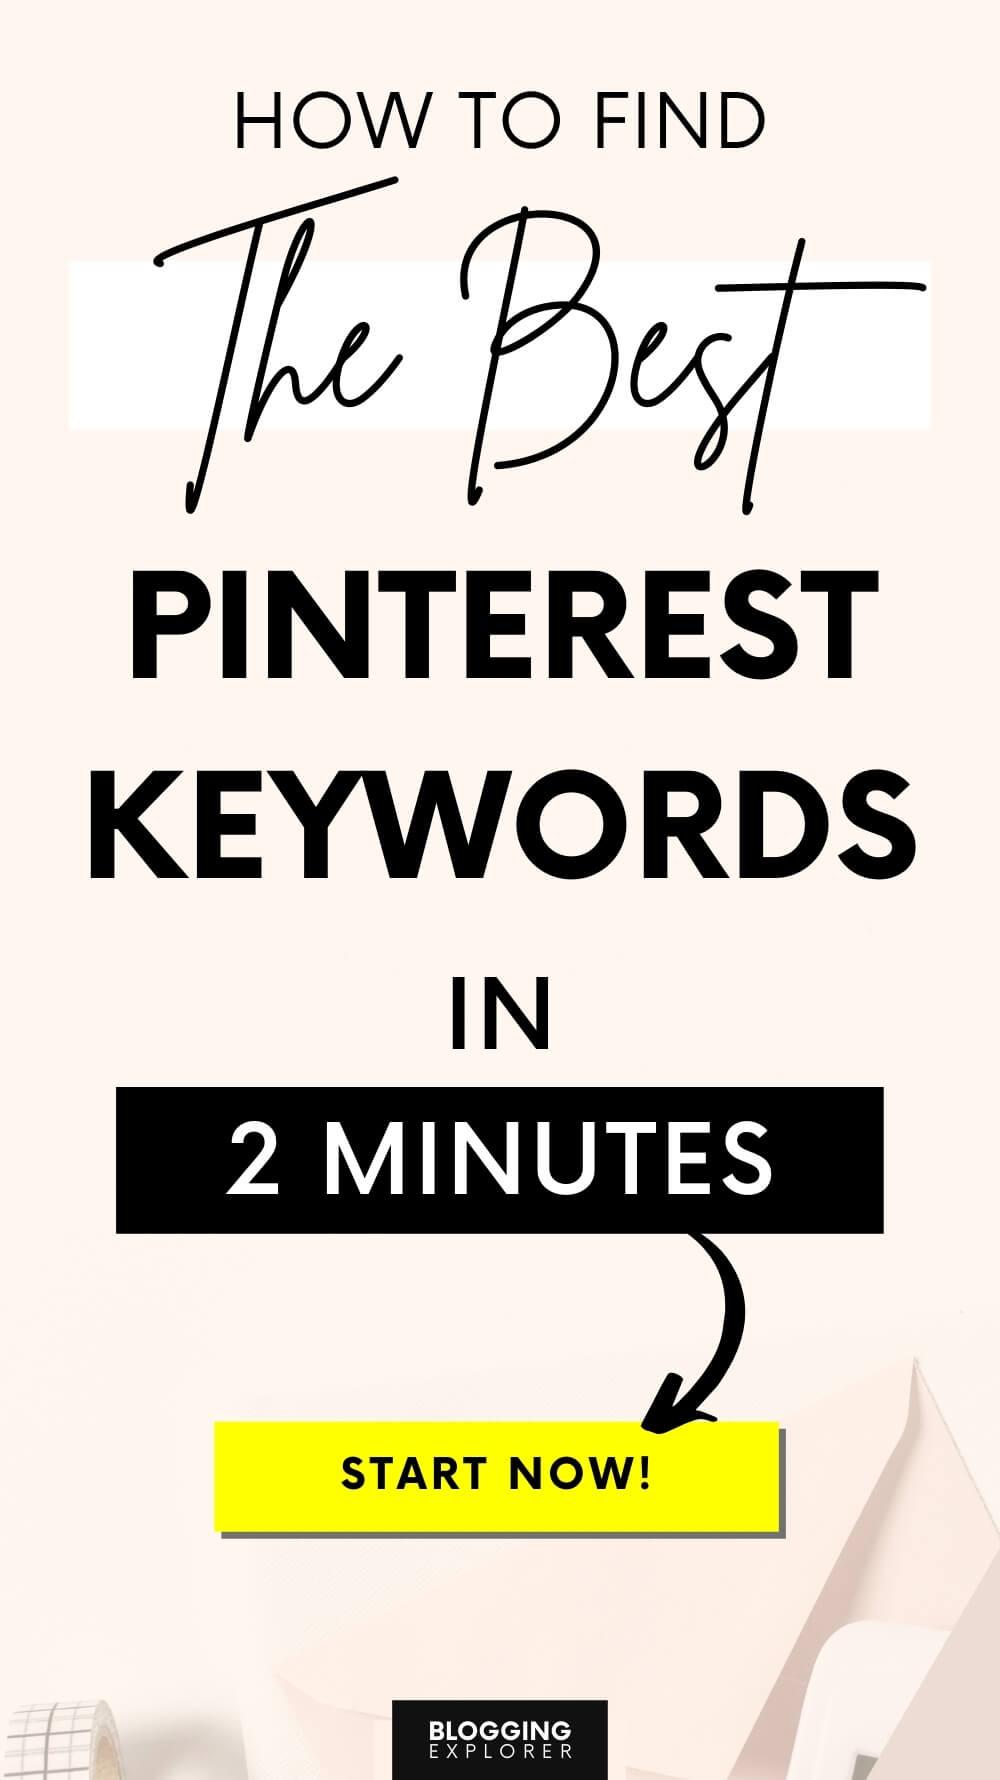 Pinterest keyword research guide for blog traffic - Blogging Explorer